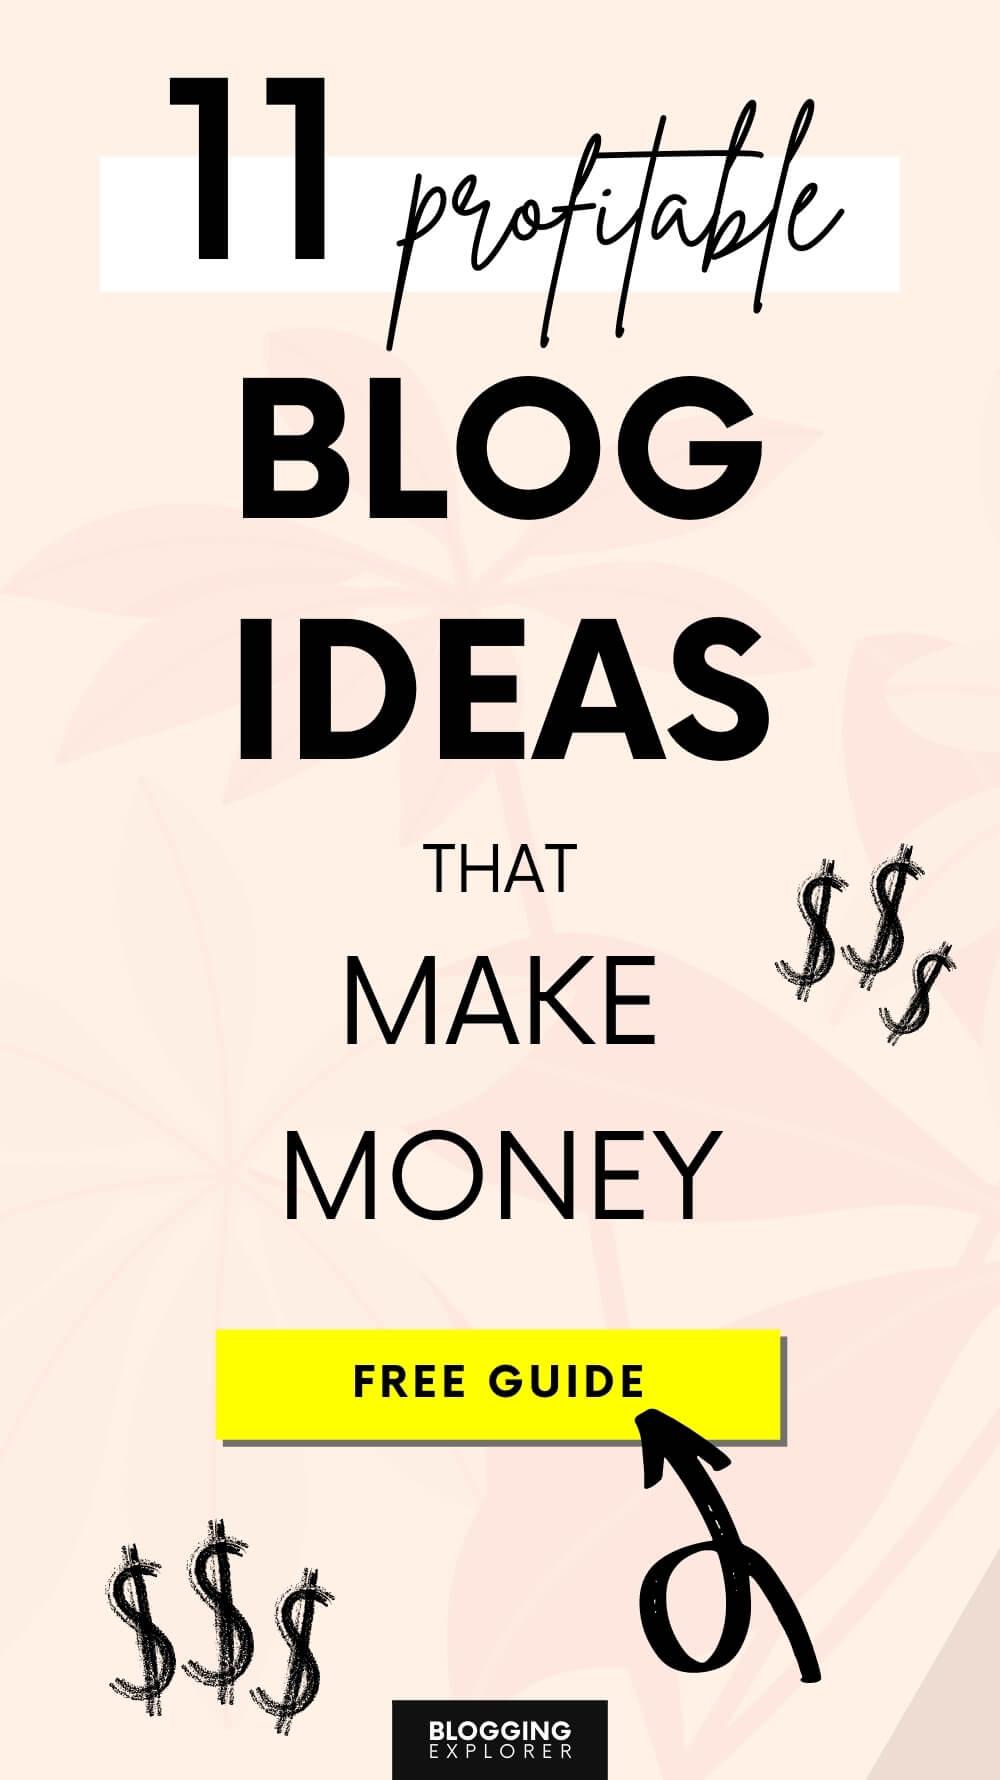 Blog ideas that make money - Start a blog to make money online - Blogging Explorer